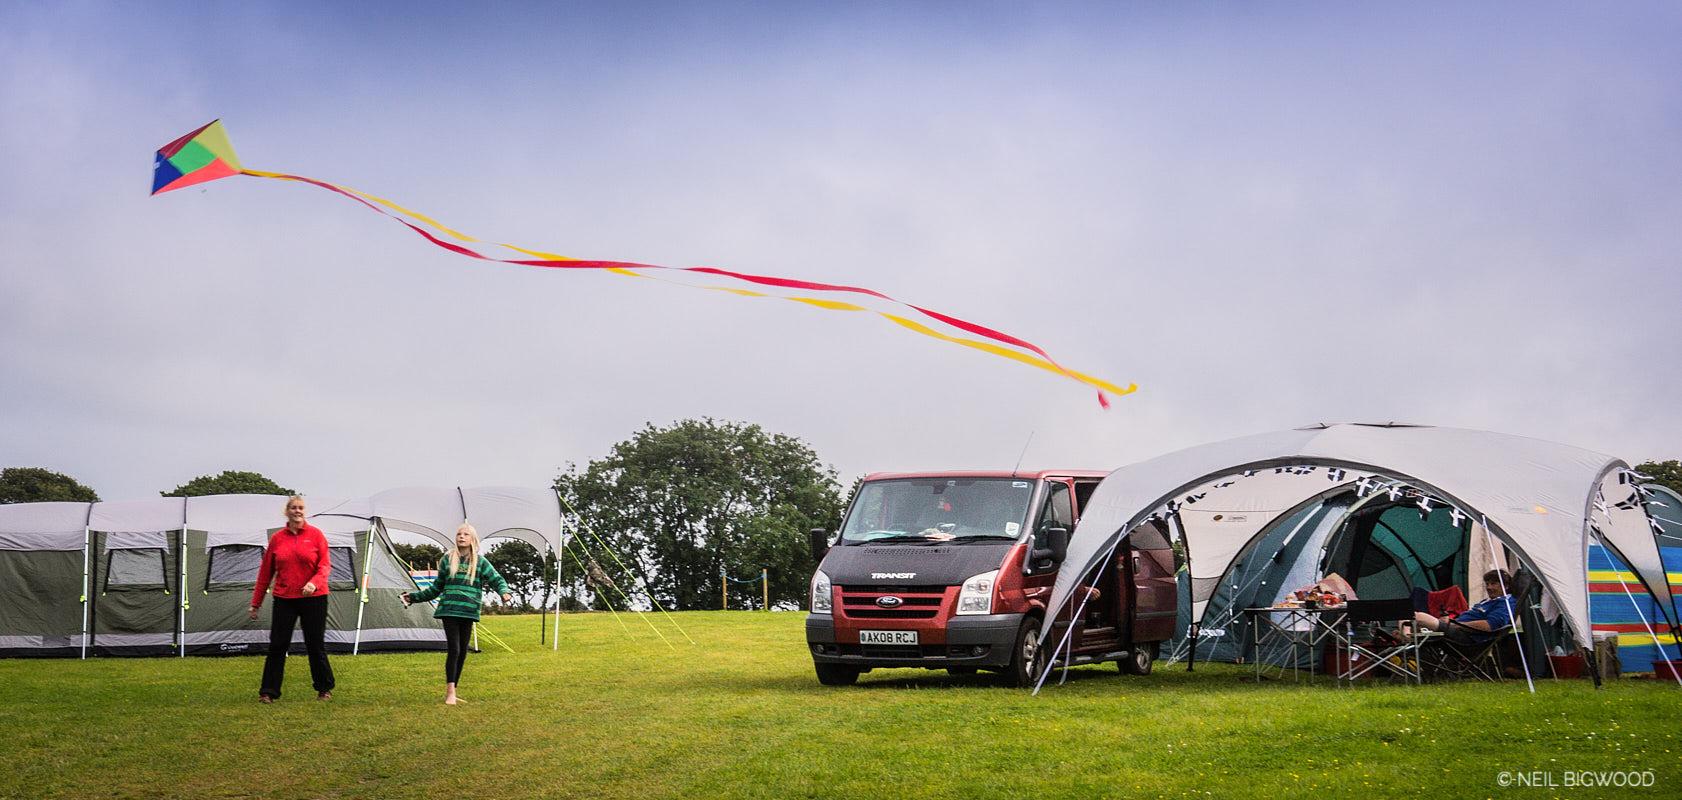 Neil-Bigwood-Monkton-Wyld-Camping-76